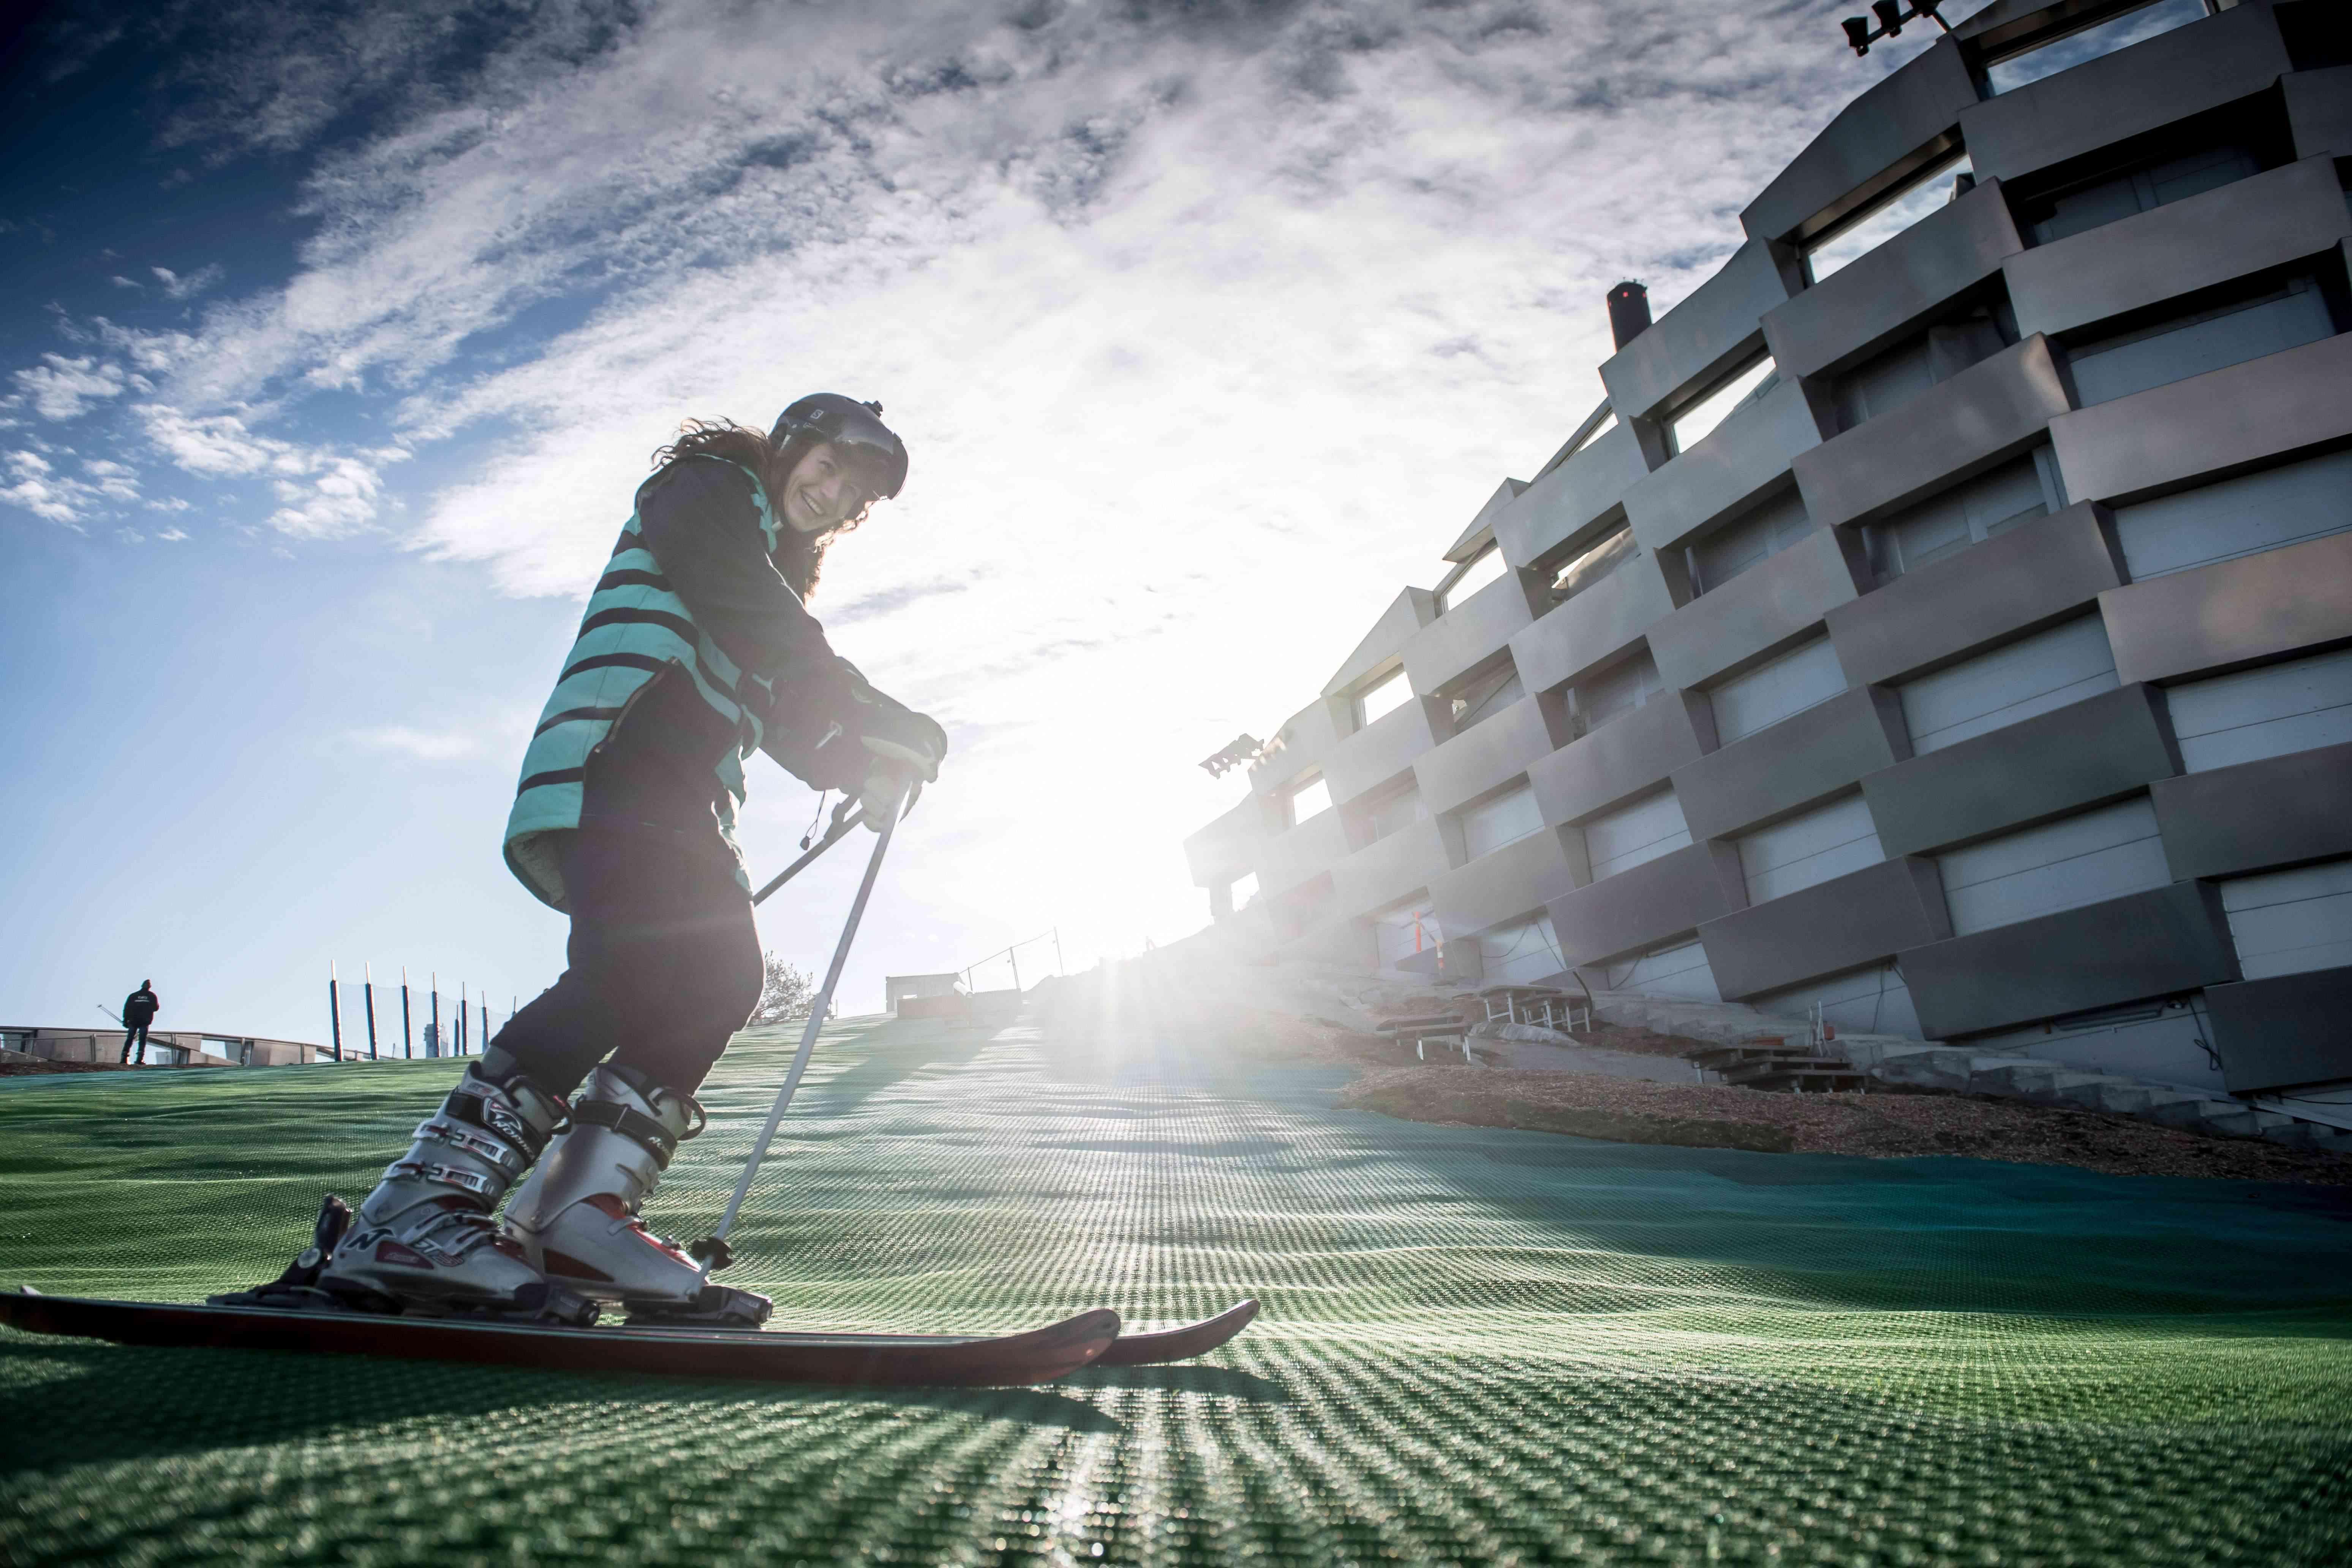 Happy skier at Copenhill, Denmark